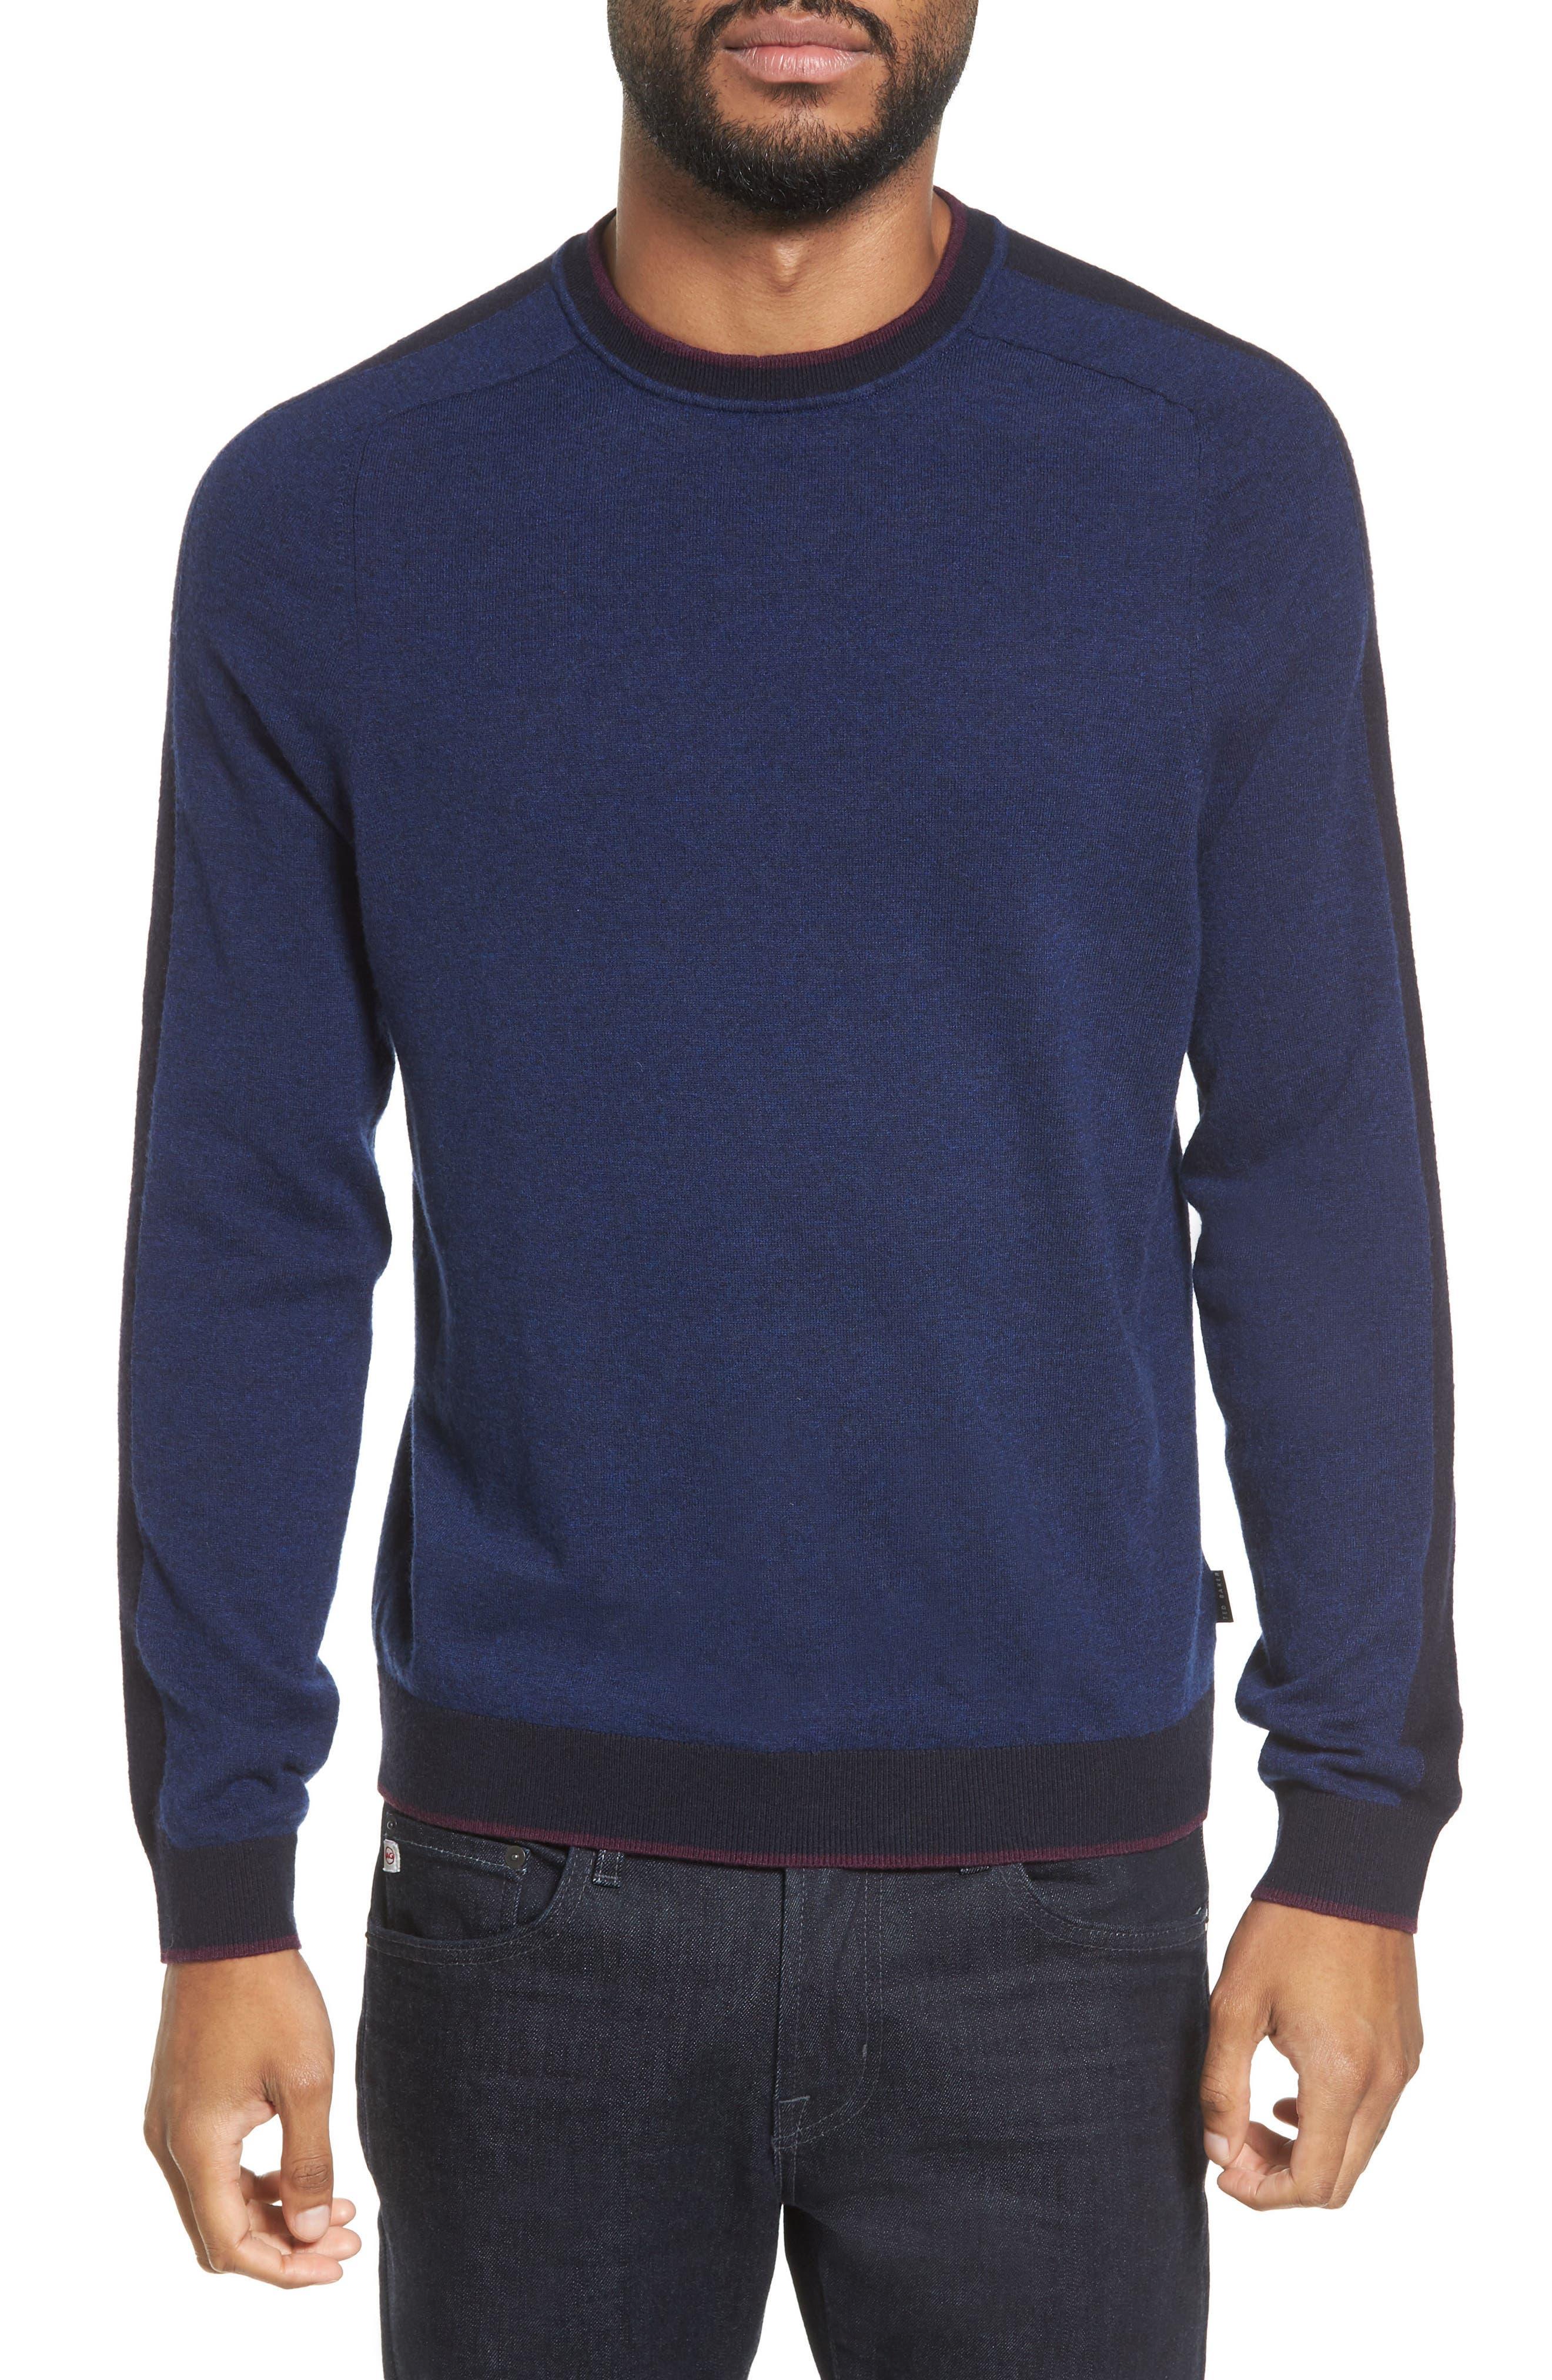 Norpol Crewneck Sweater,                             Main thumbnail 3, color,